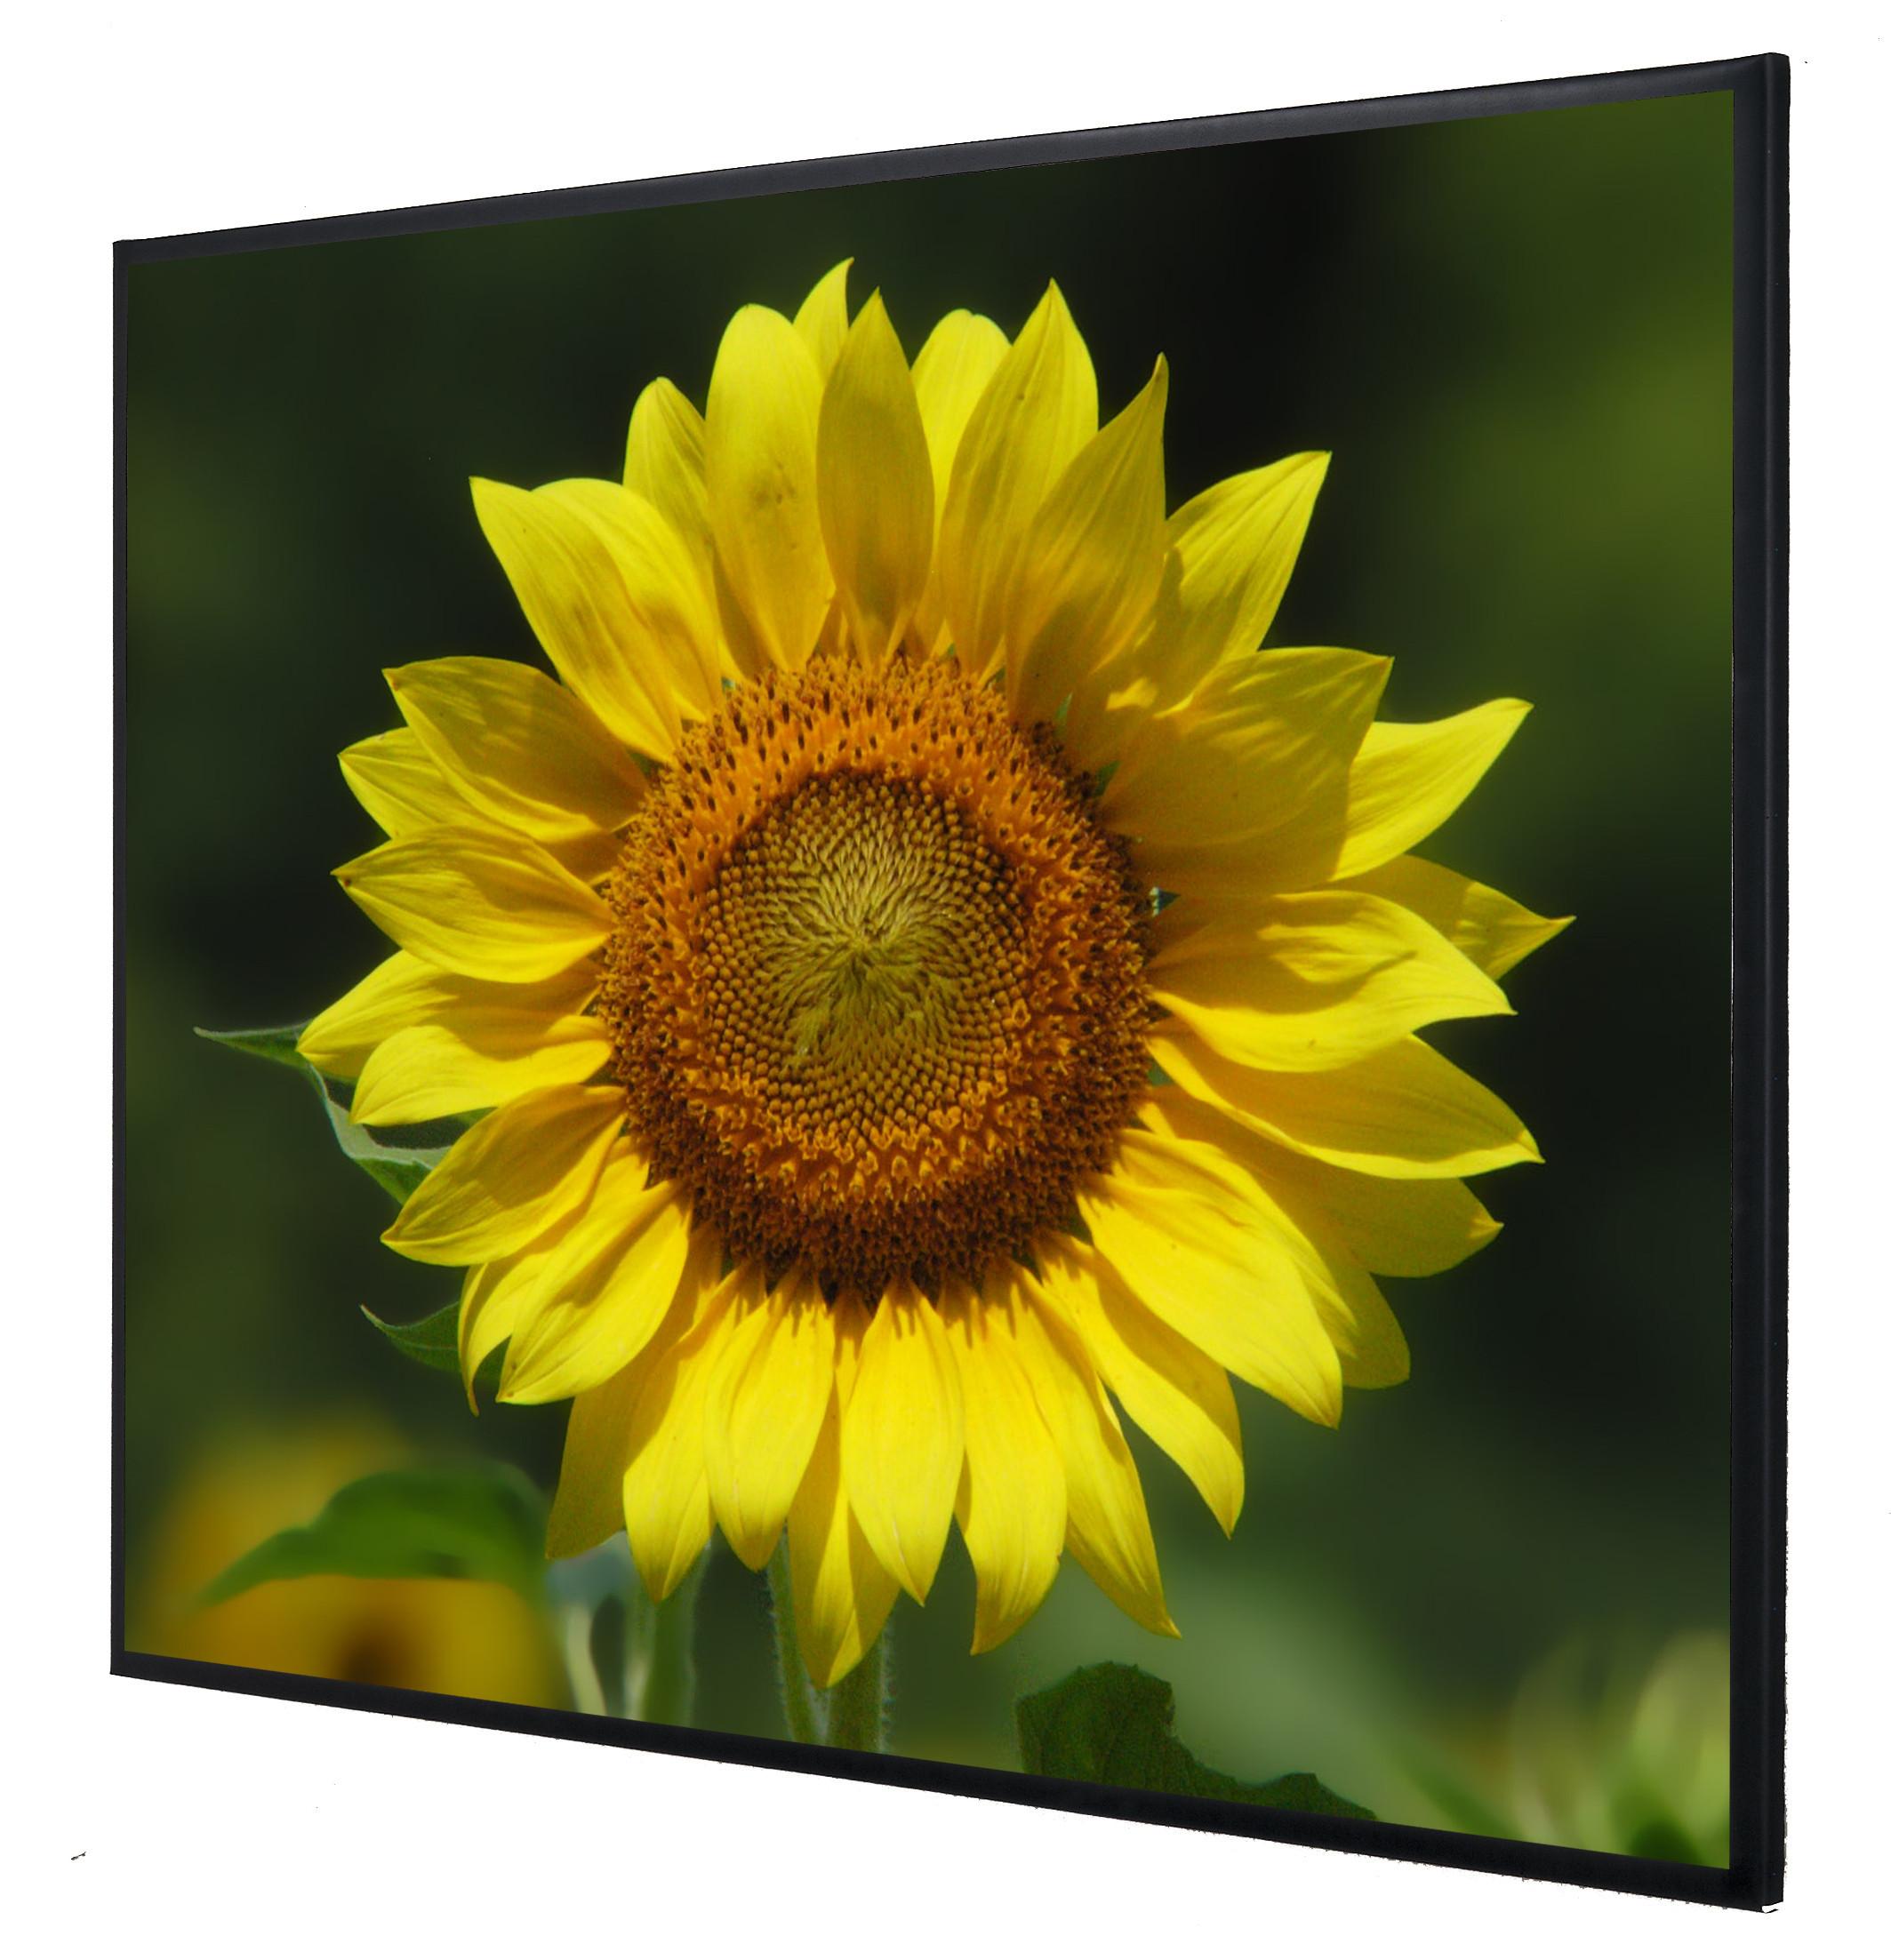 Vision Light 200 x 150 cm video format med Veltex og ReAct filmdug